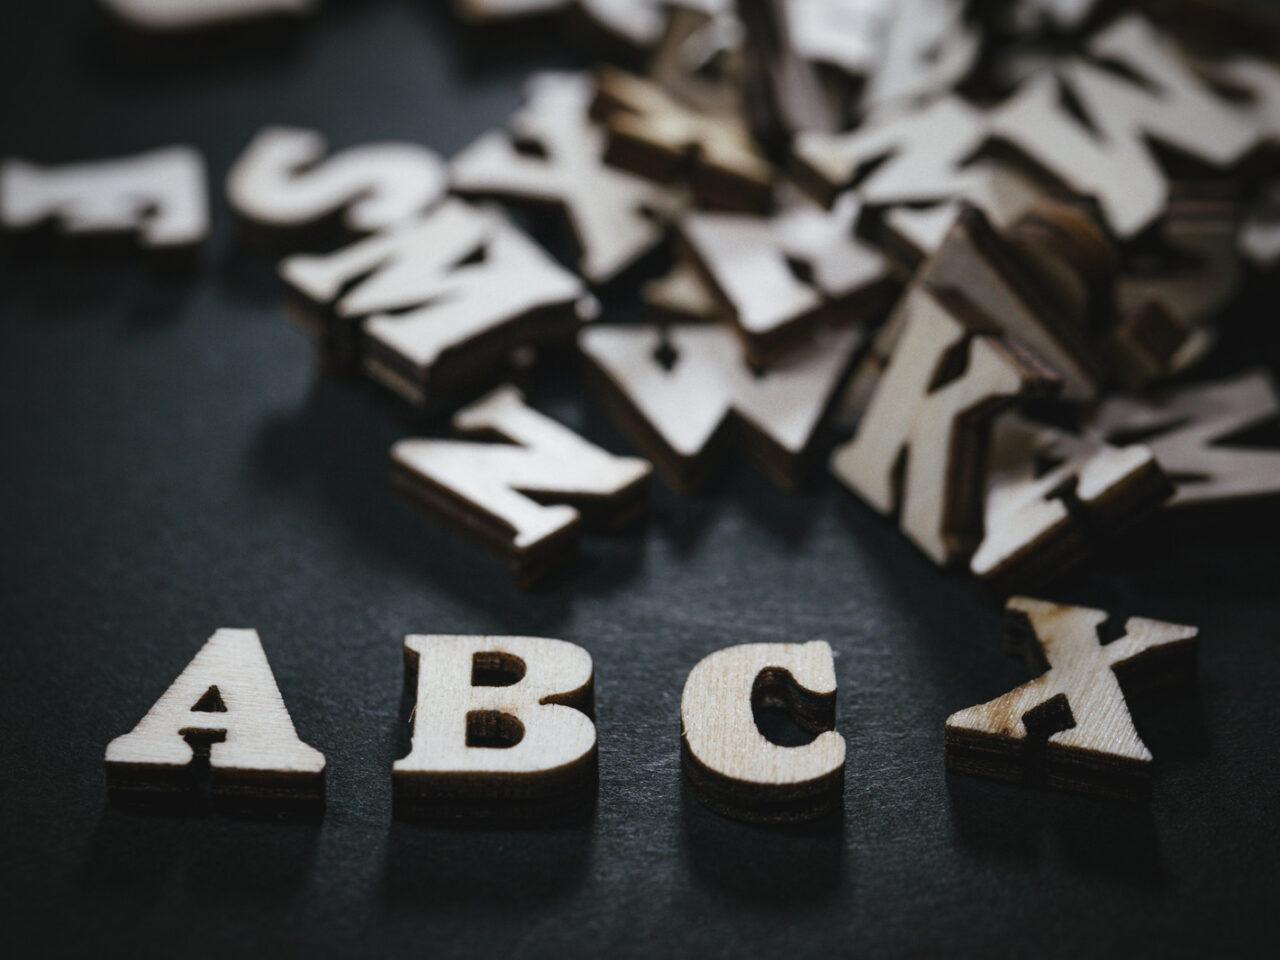 「N」の特殊文字&記号コピーツール!可愛いアルファベットをコピペで取得のサムネイル画像